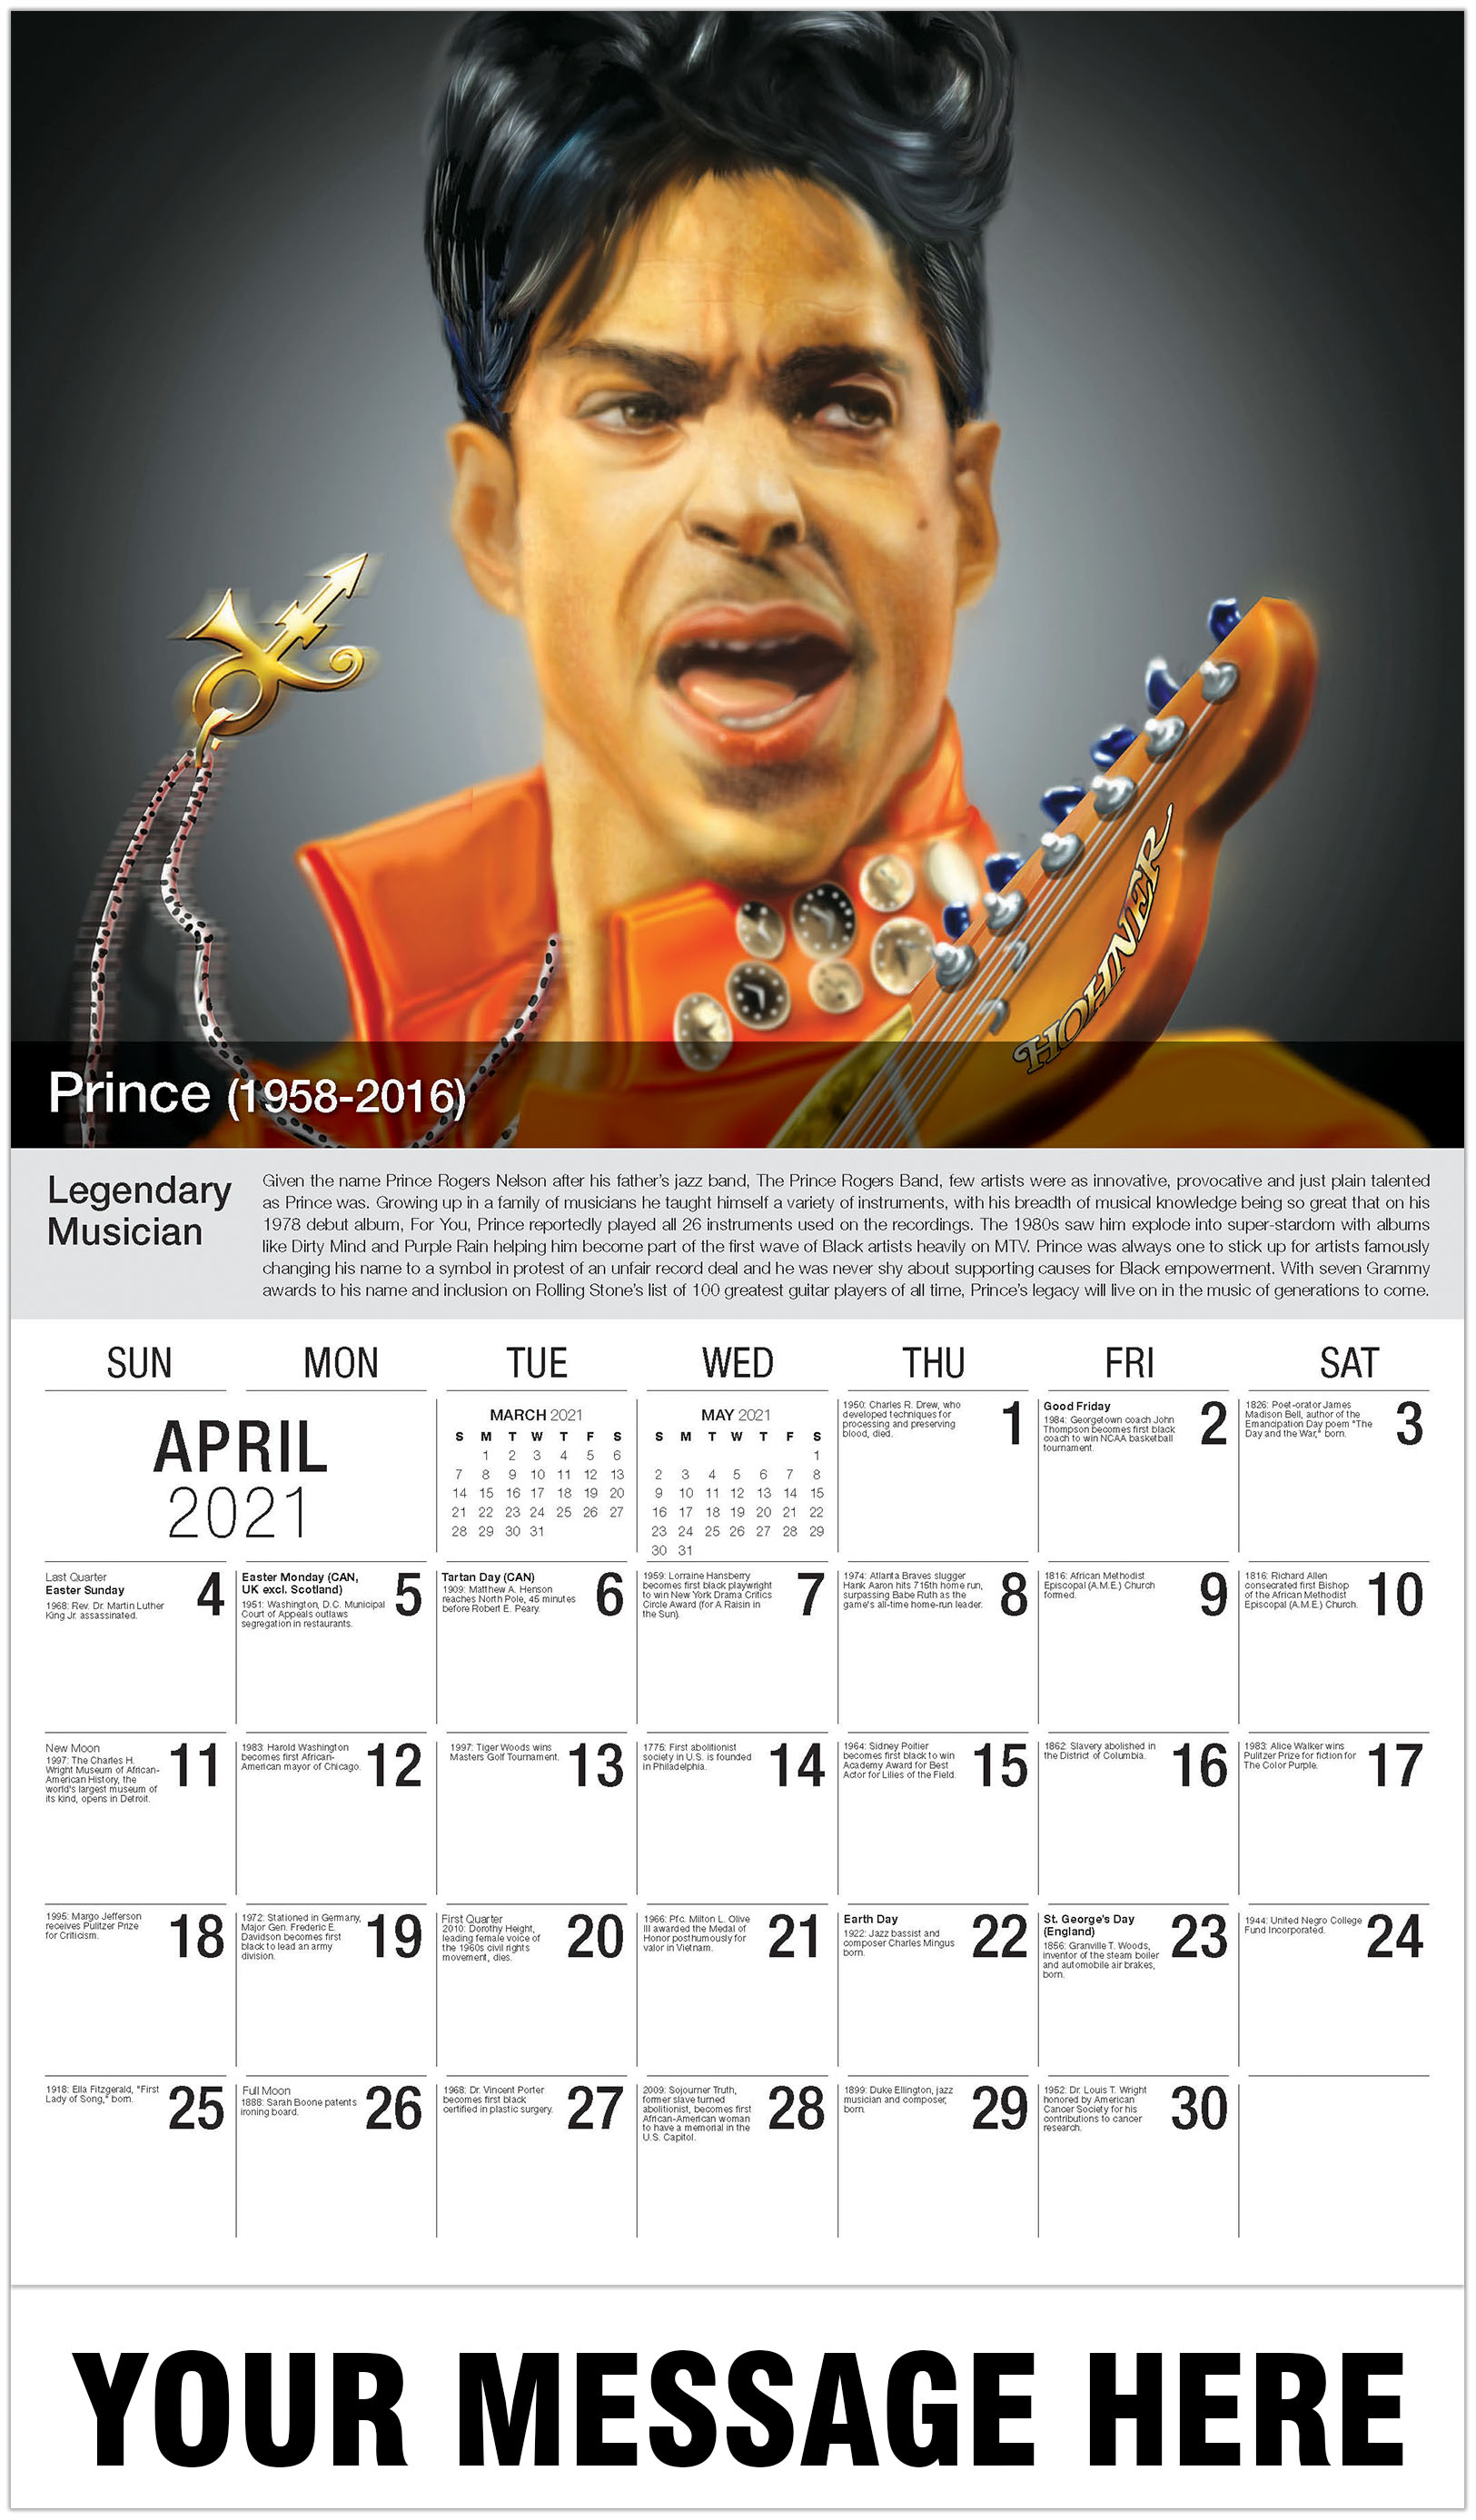 Prince - April - Black History 2021 Promotional Calendar